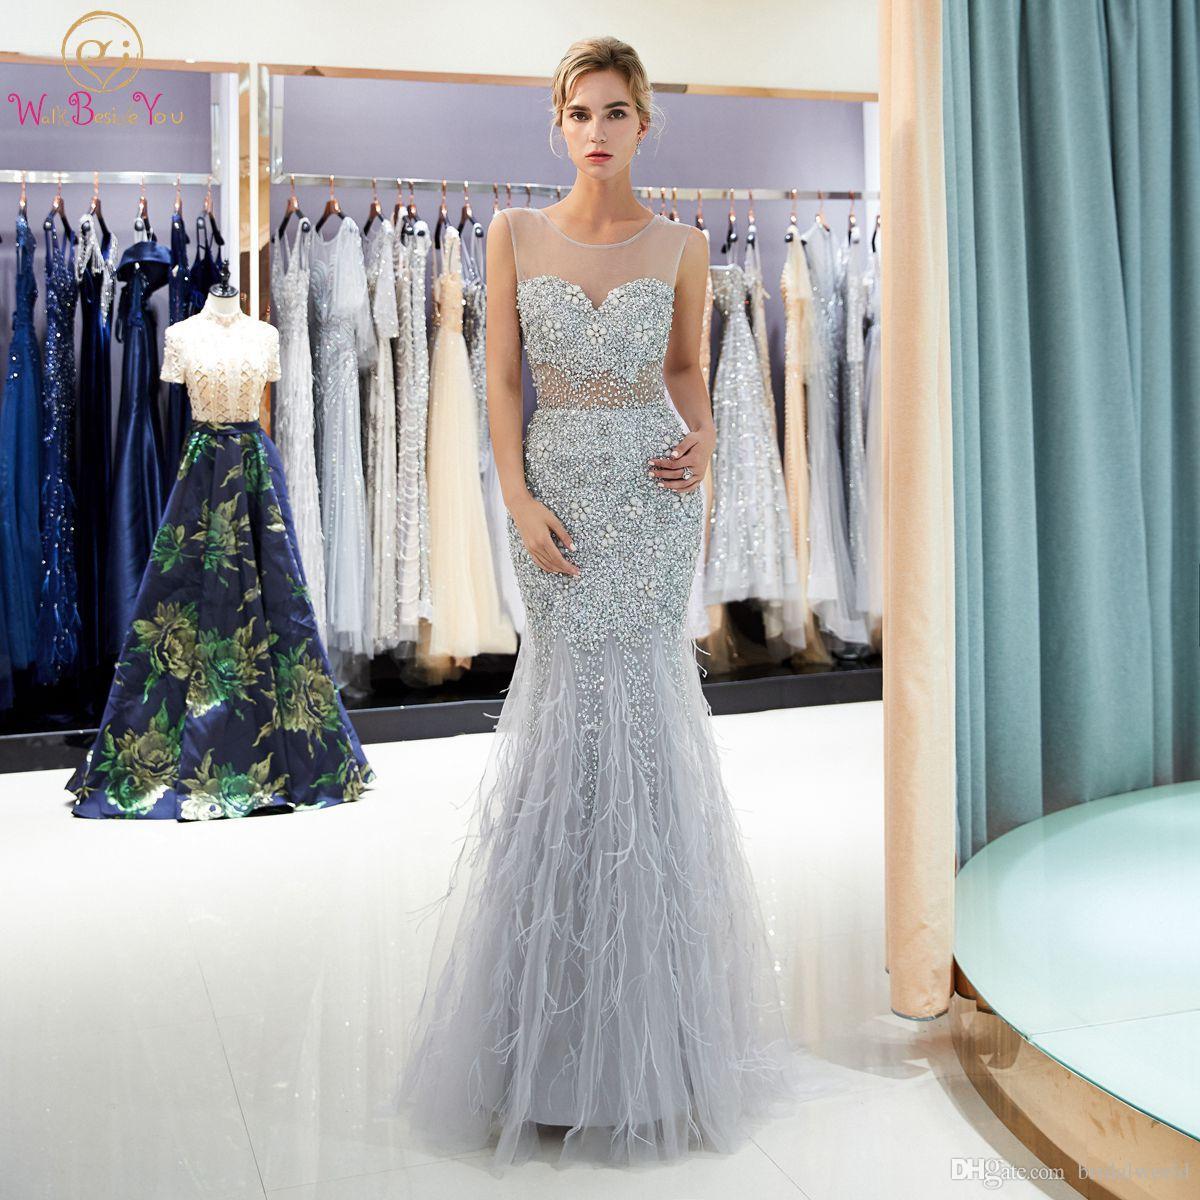 Abiti Cerimonia Queen.Sexy Prom Dresses Abiti Cerimonia Donna Beaded Crystal Sheer Neck